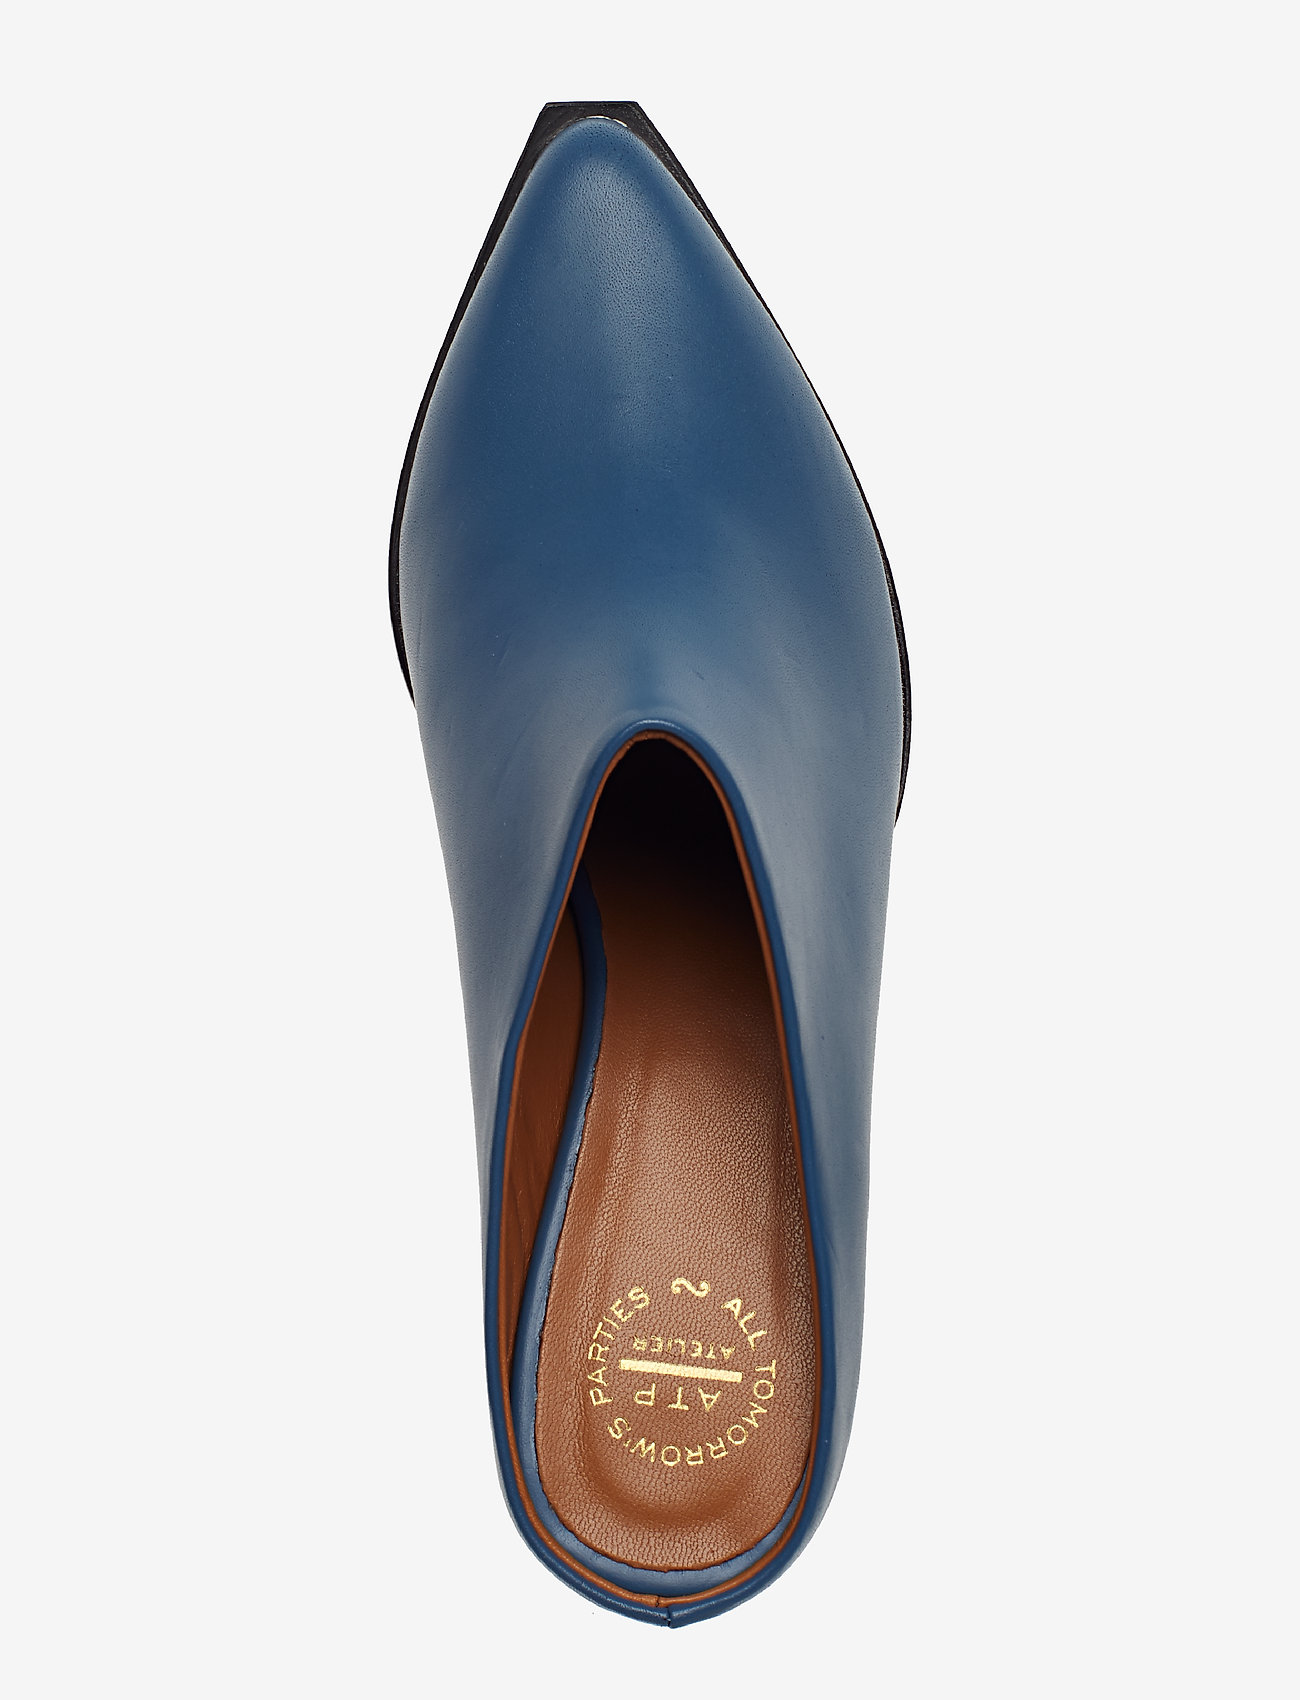 Fave Sky Blue Vacchetta (Sky Blue) (999.60 kr) - ATP Atelier